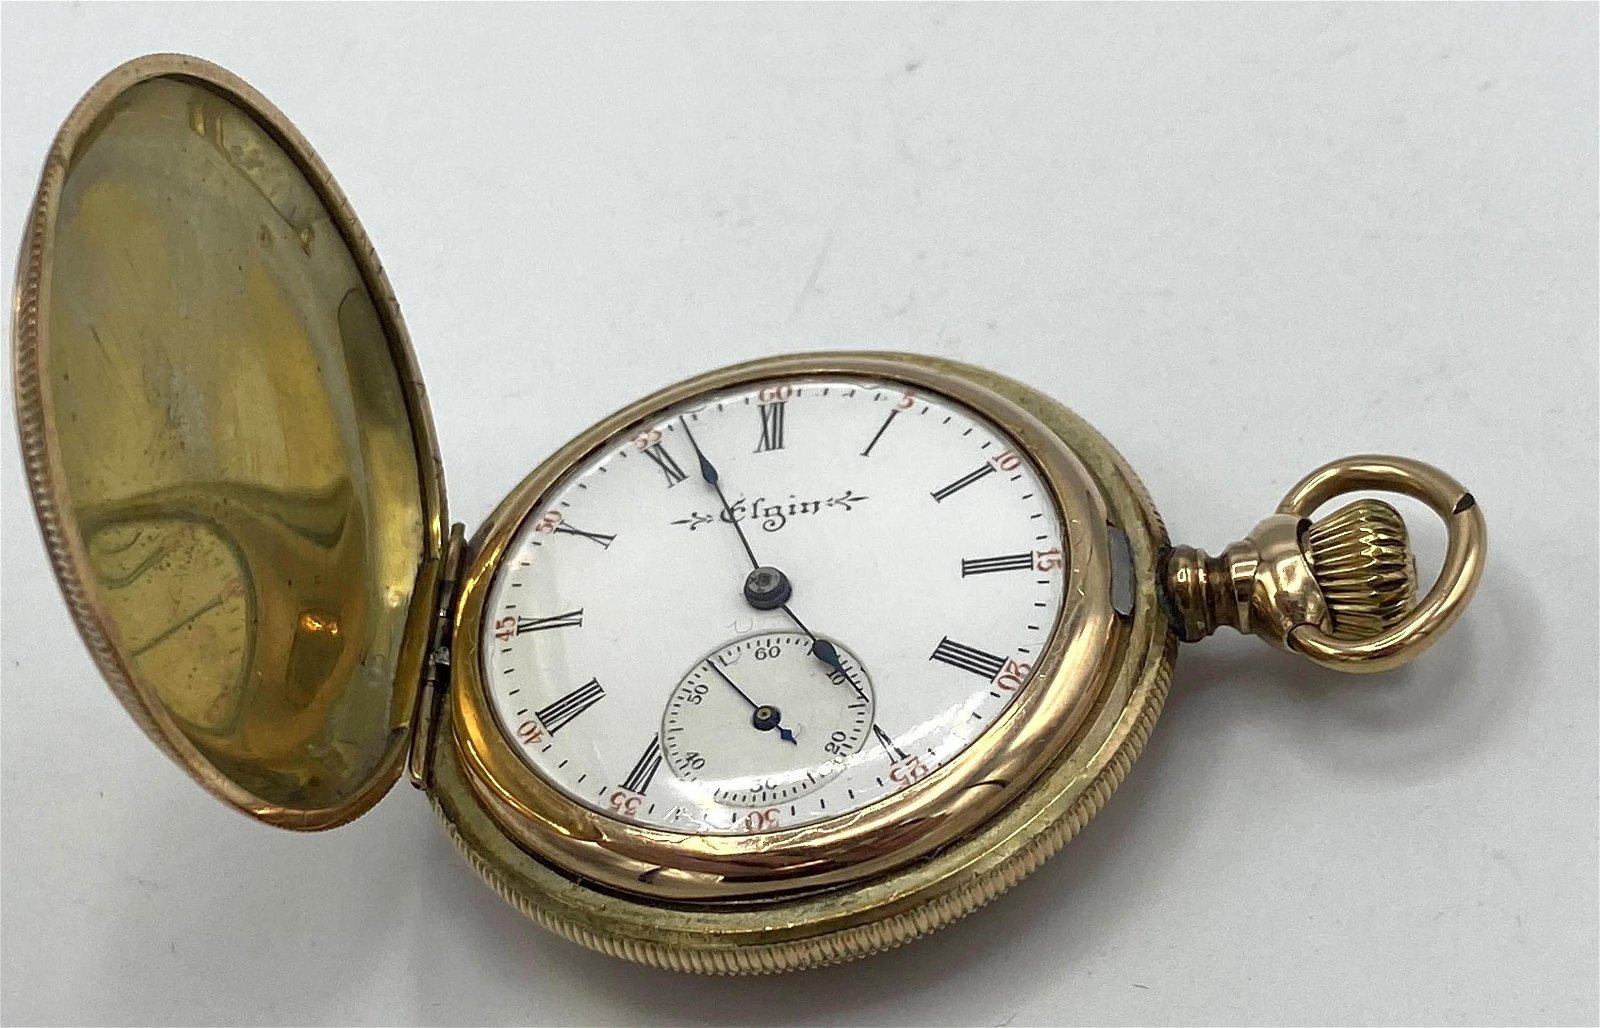 14K Gold ELGIN Pocket Watch.. ttl wgt 25.3 dwt